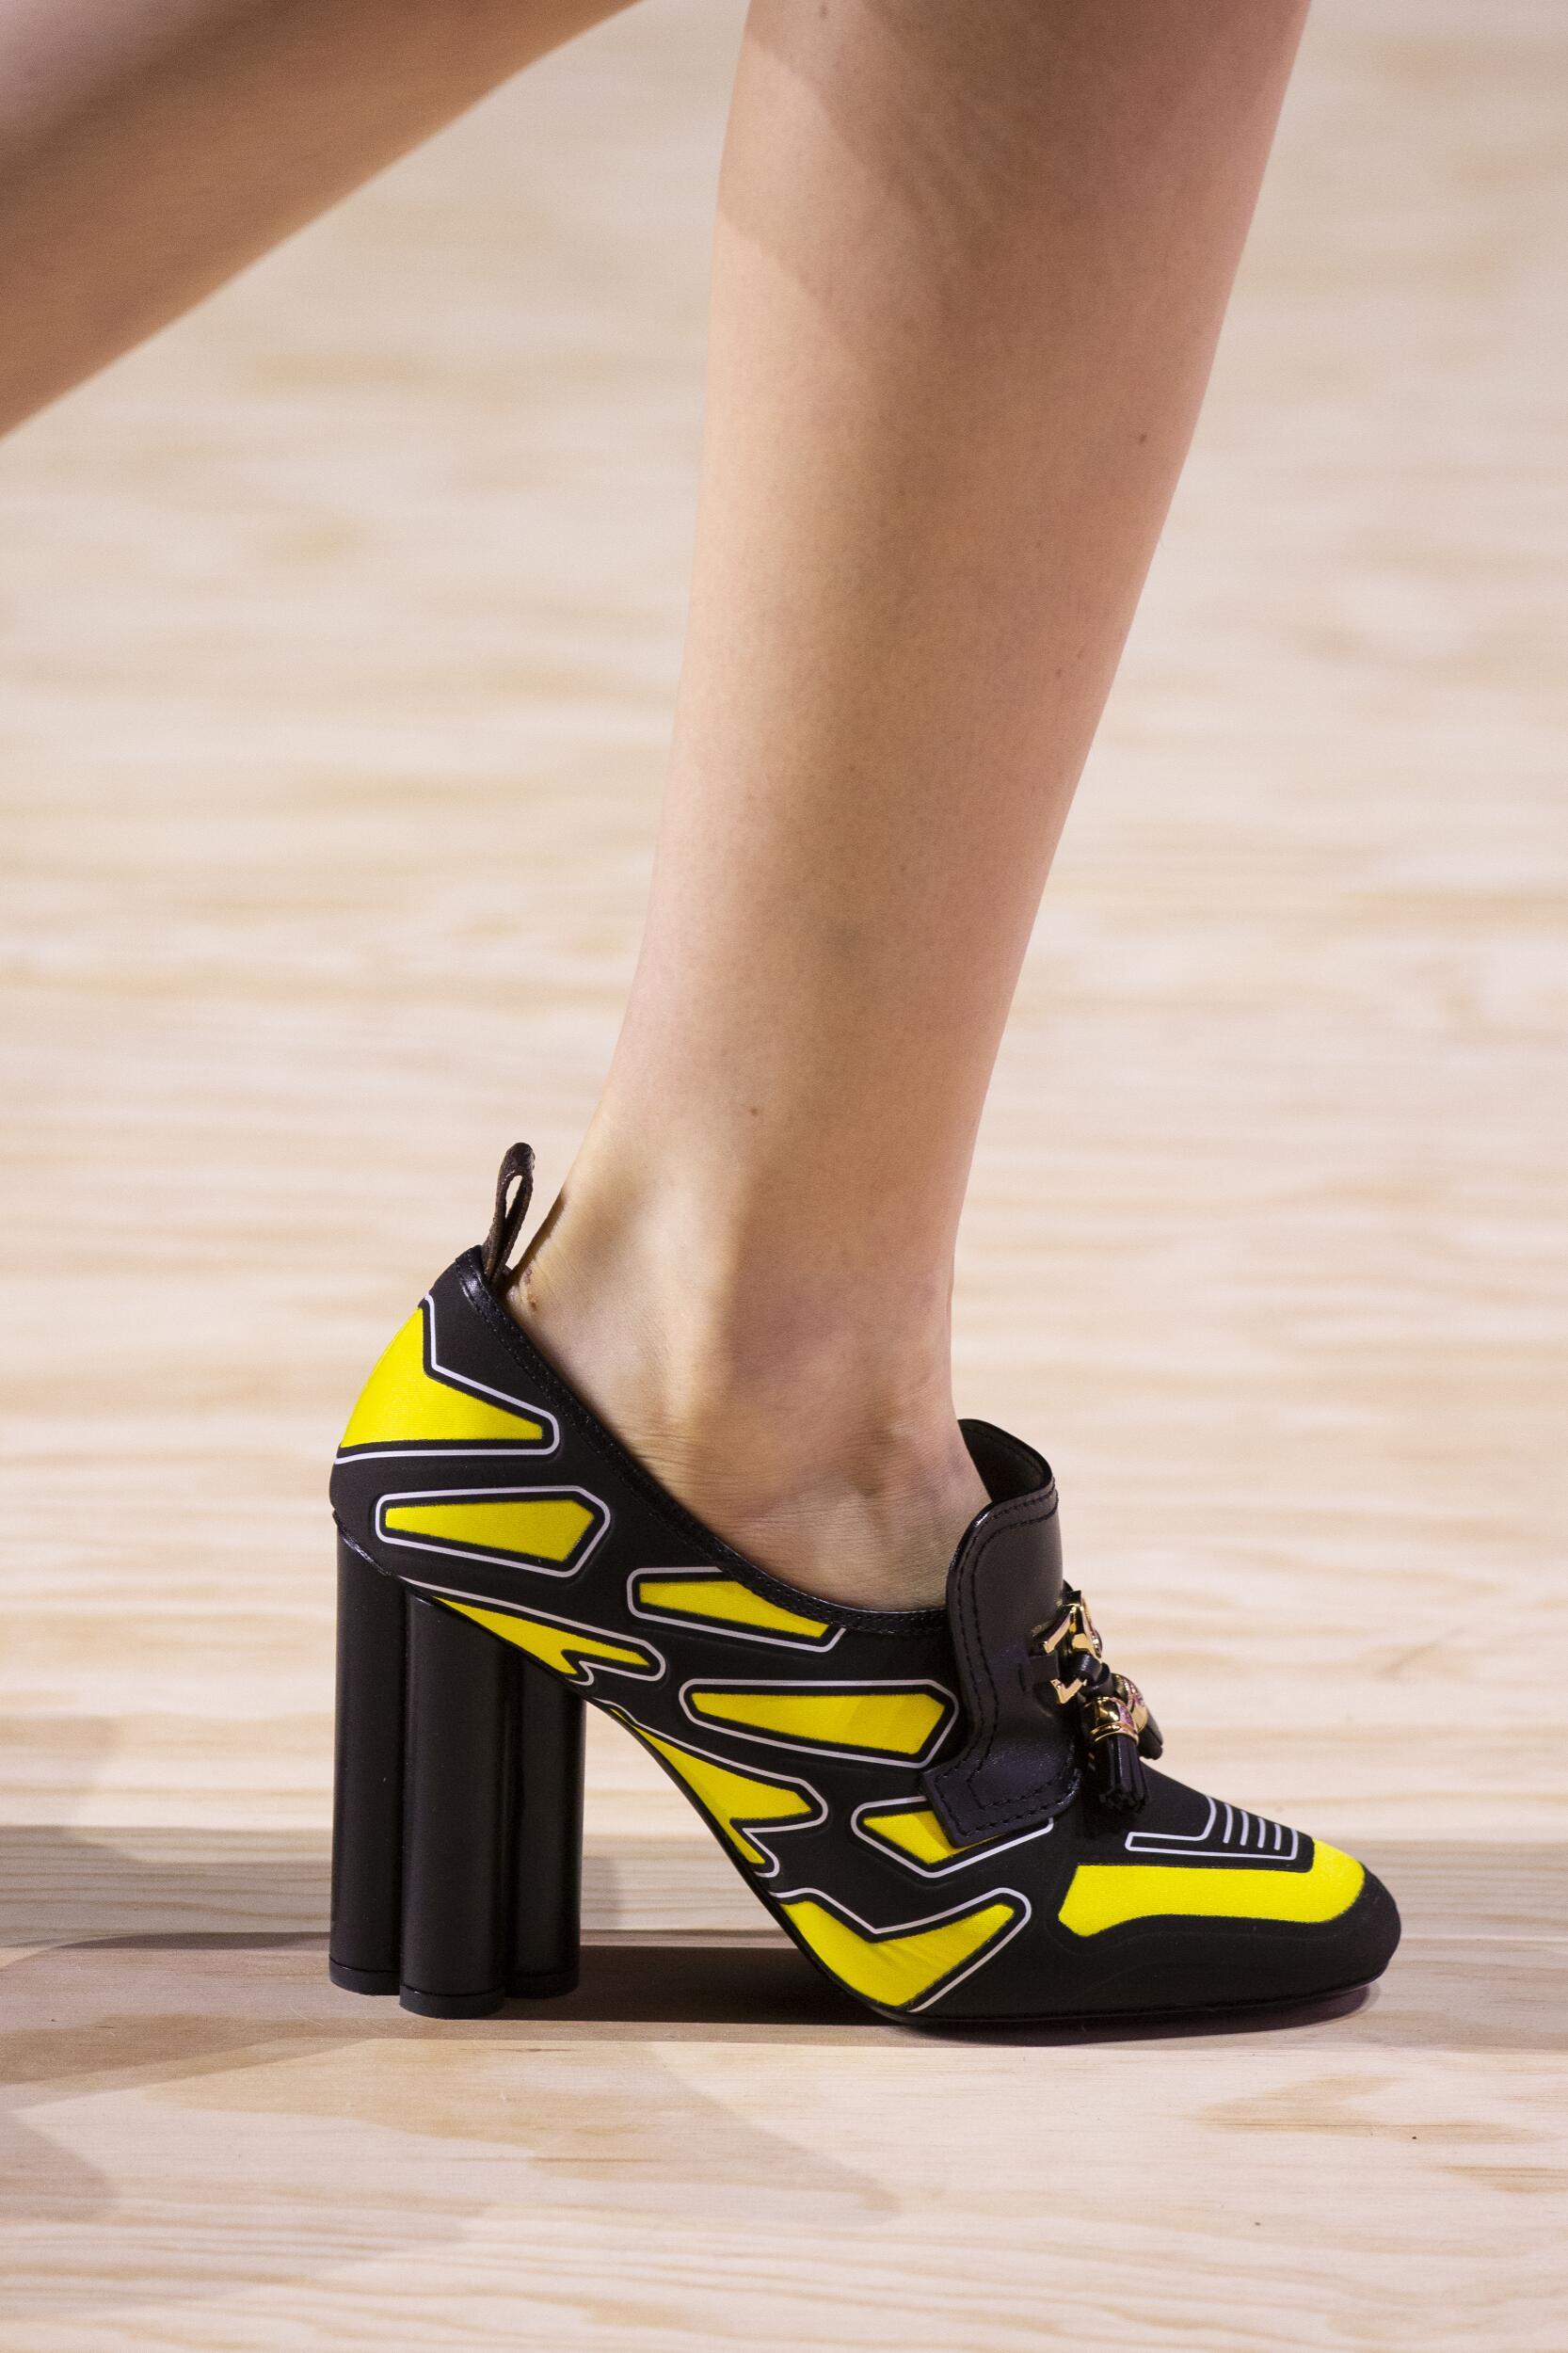 2020 Woman Shoes Louis Vuitton